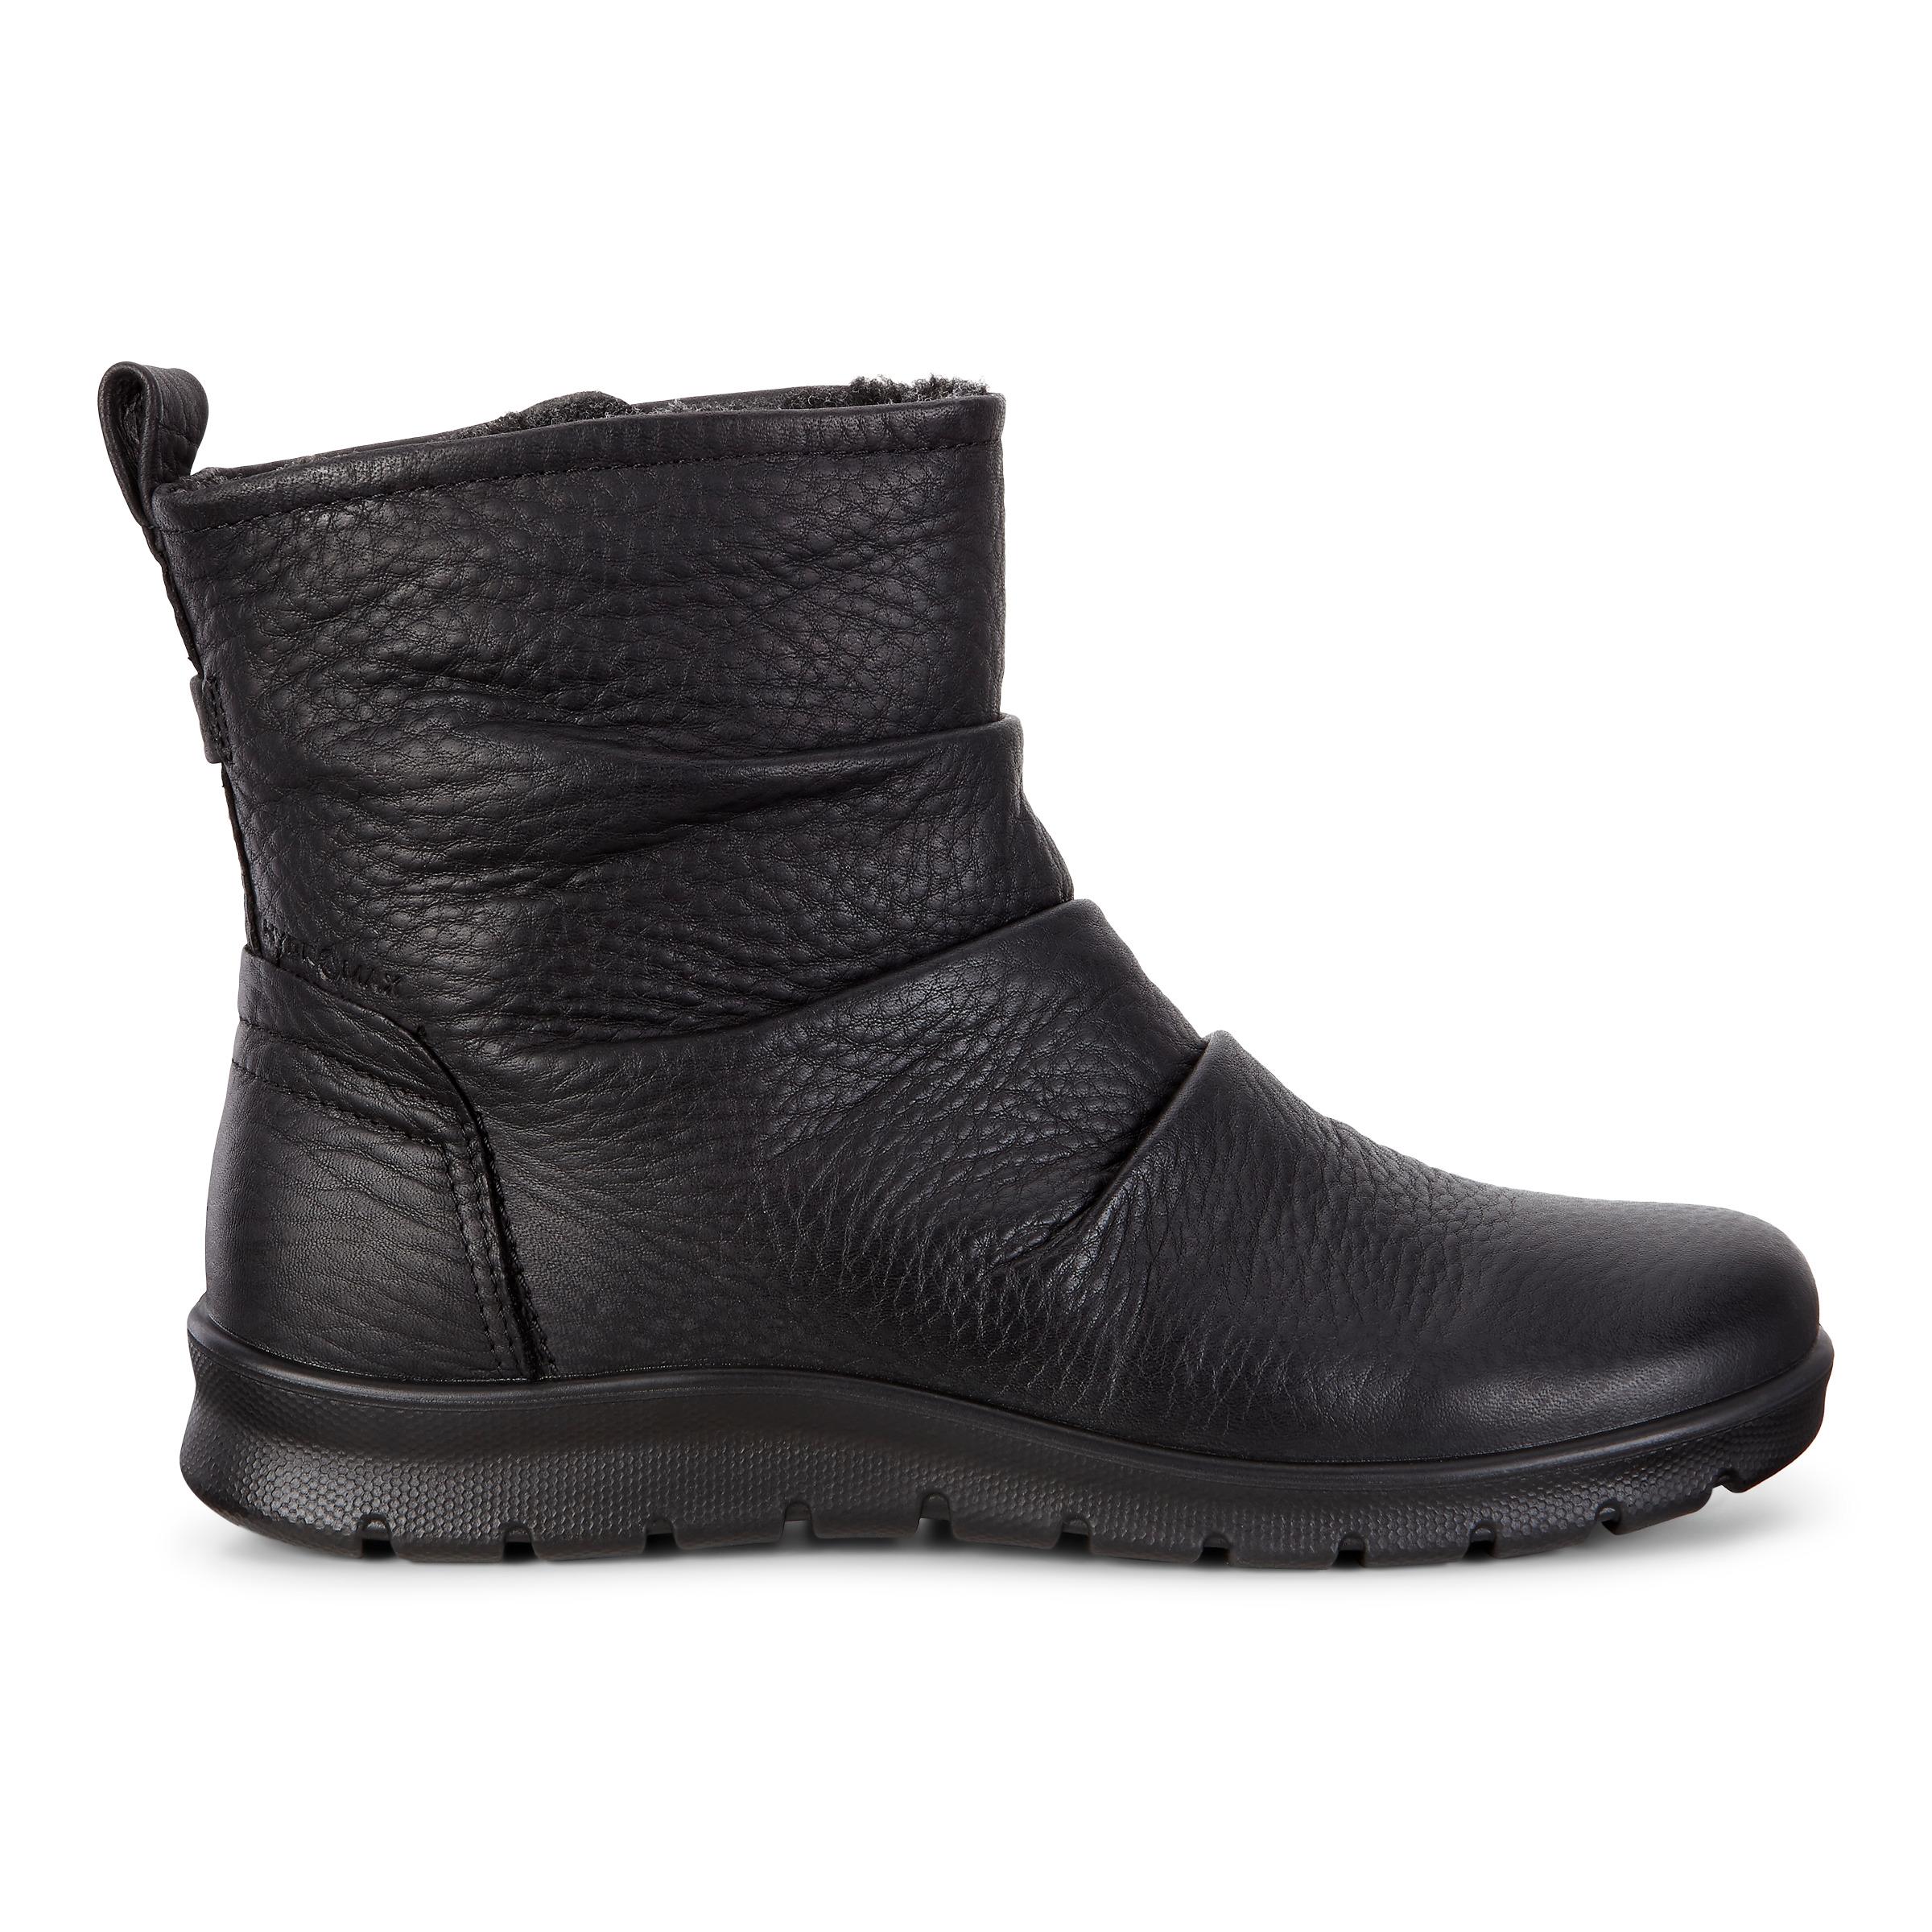 ECCO Babett Boot Ankle Boot Size 5-5.5 Black